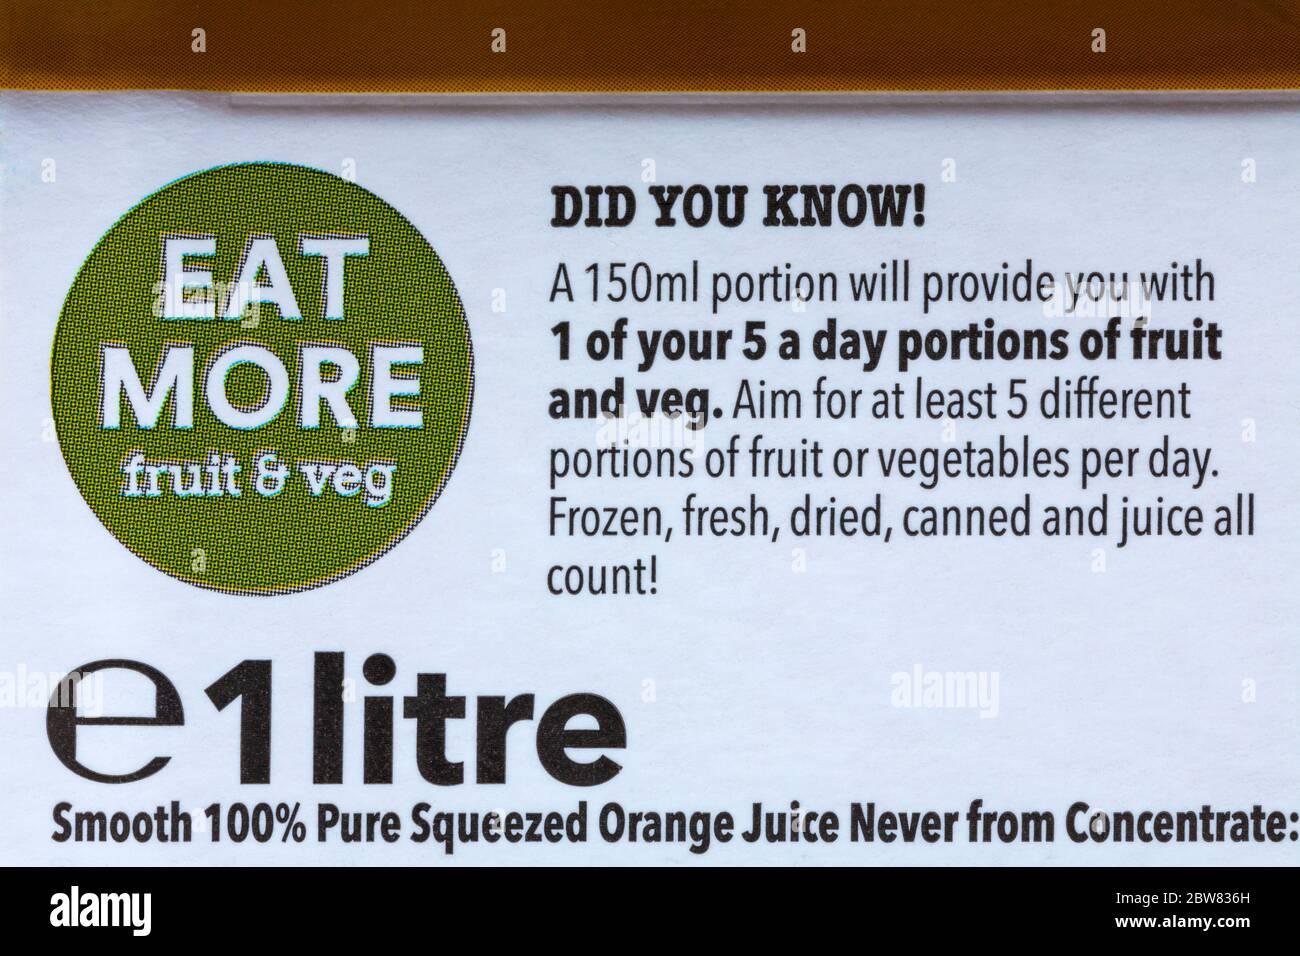 Eat more fruit & veg information on carton of Iceland 100% pure squeezed smooth orange juice Stock Photo